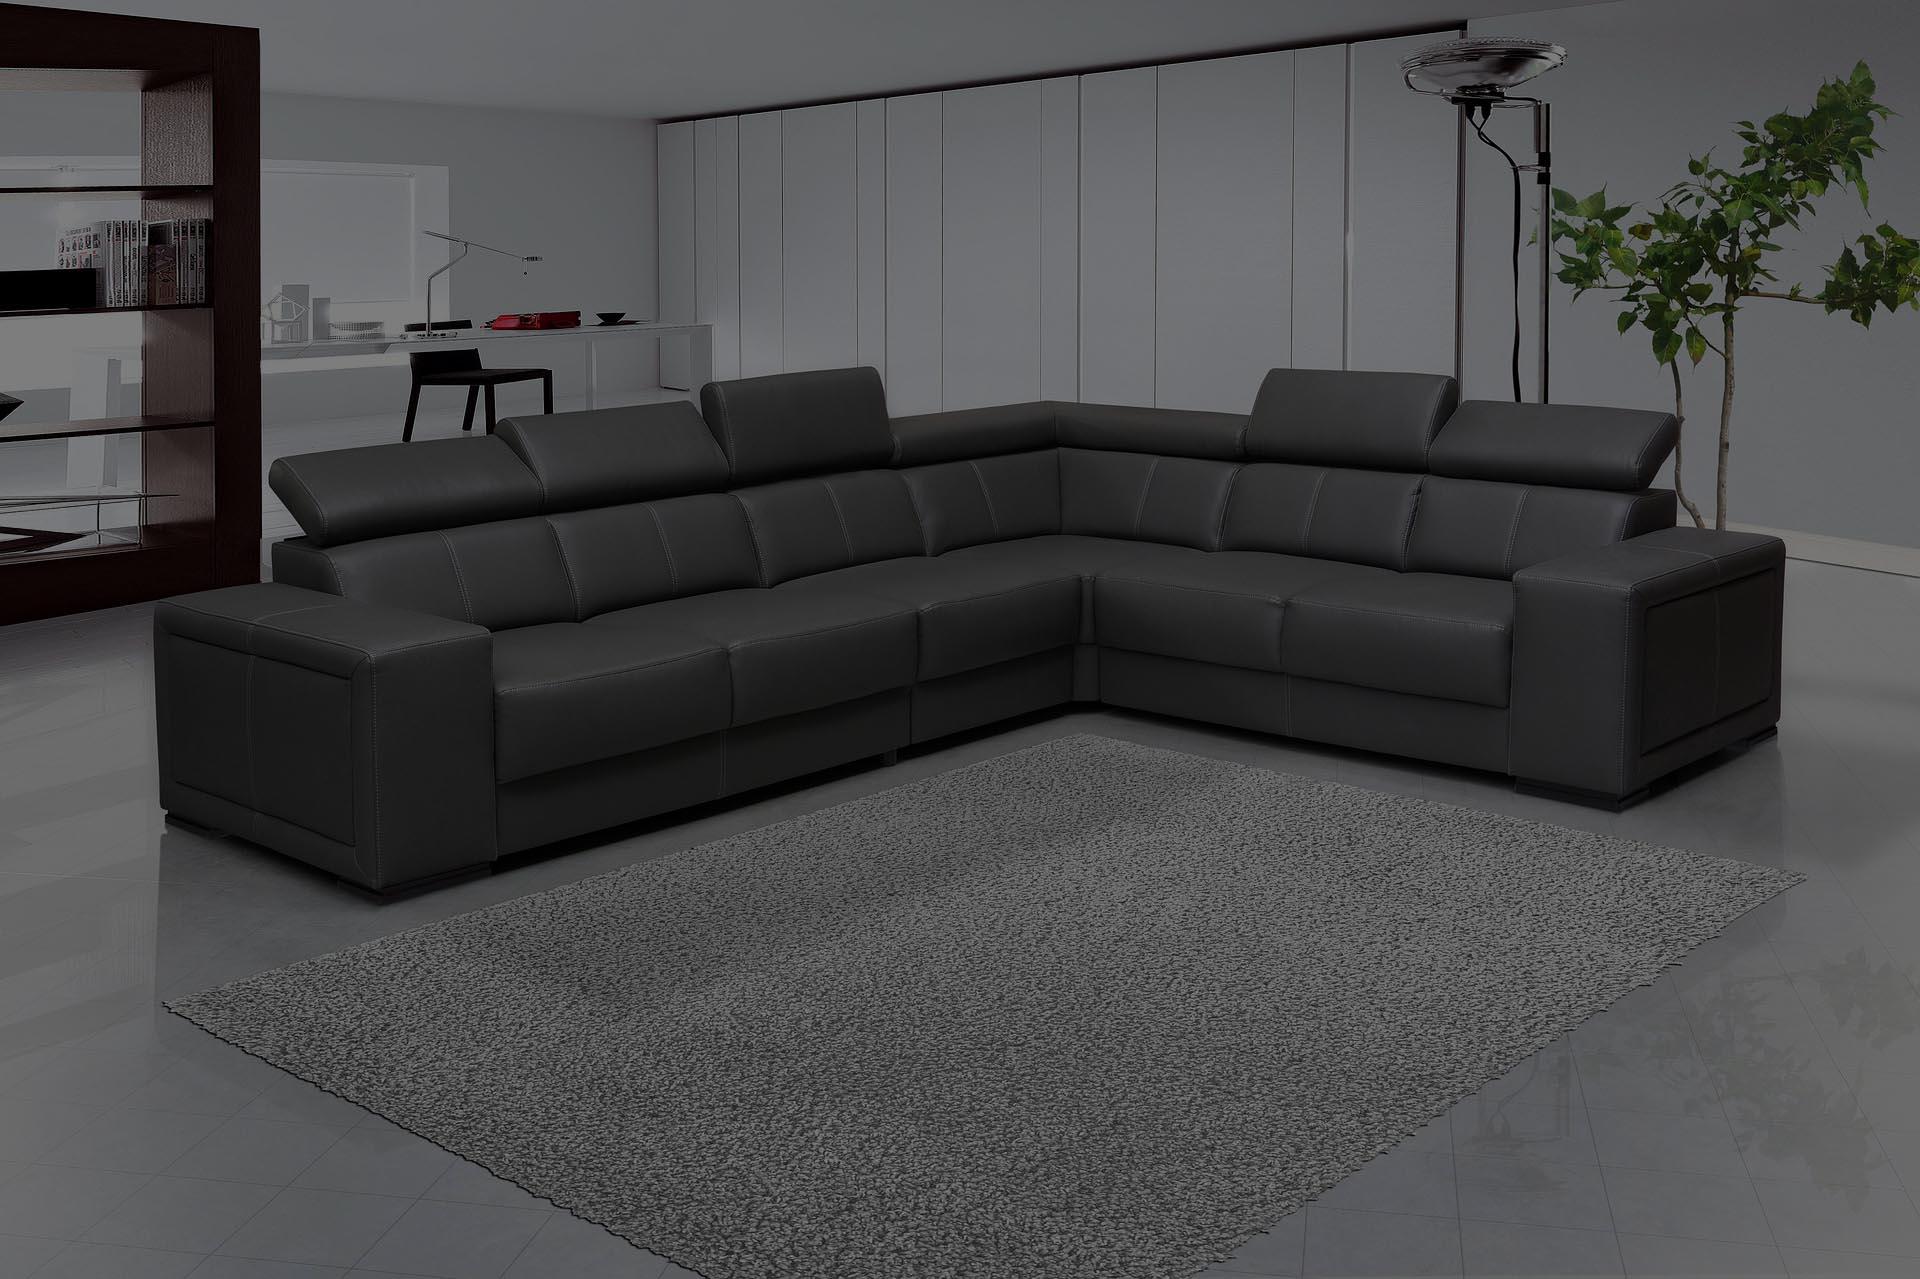 Website Design for Carpet Cleaning